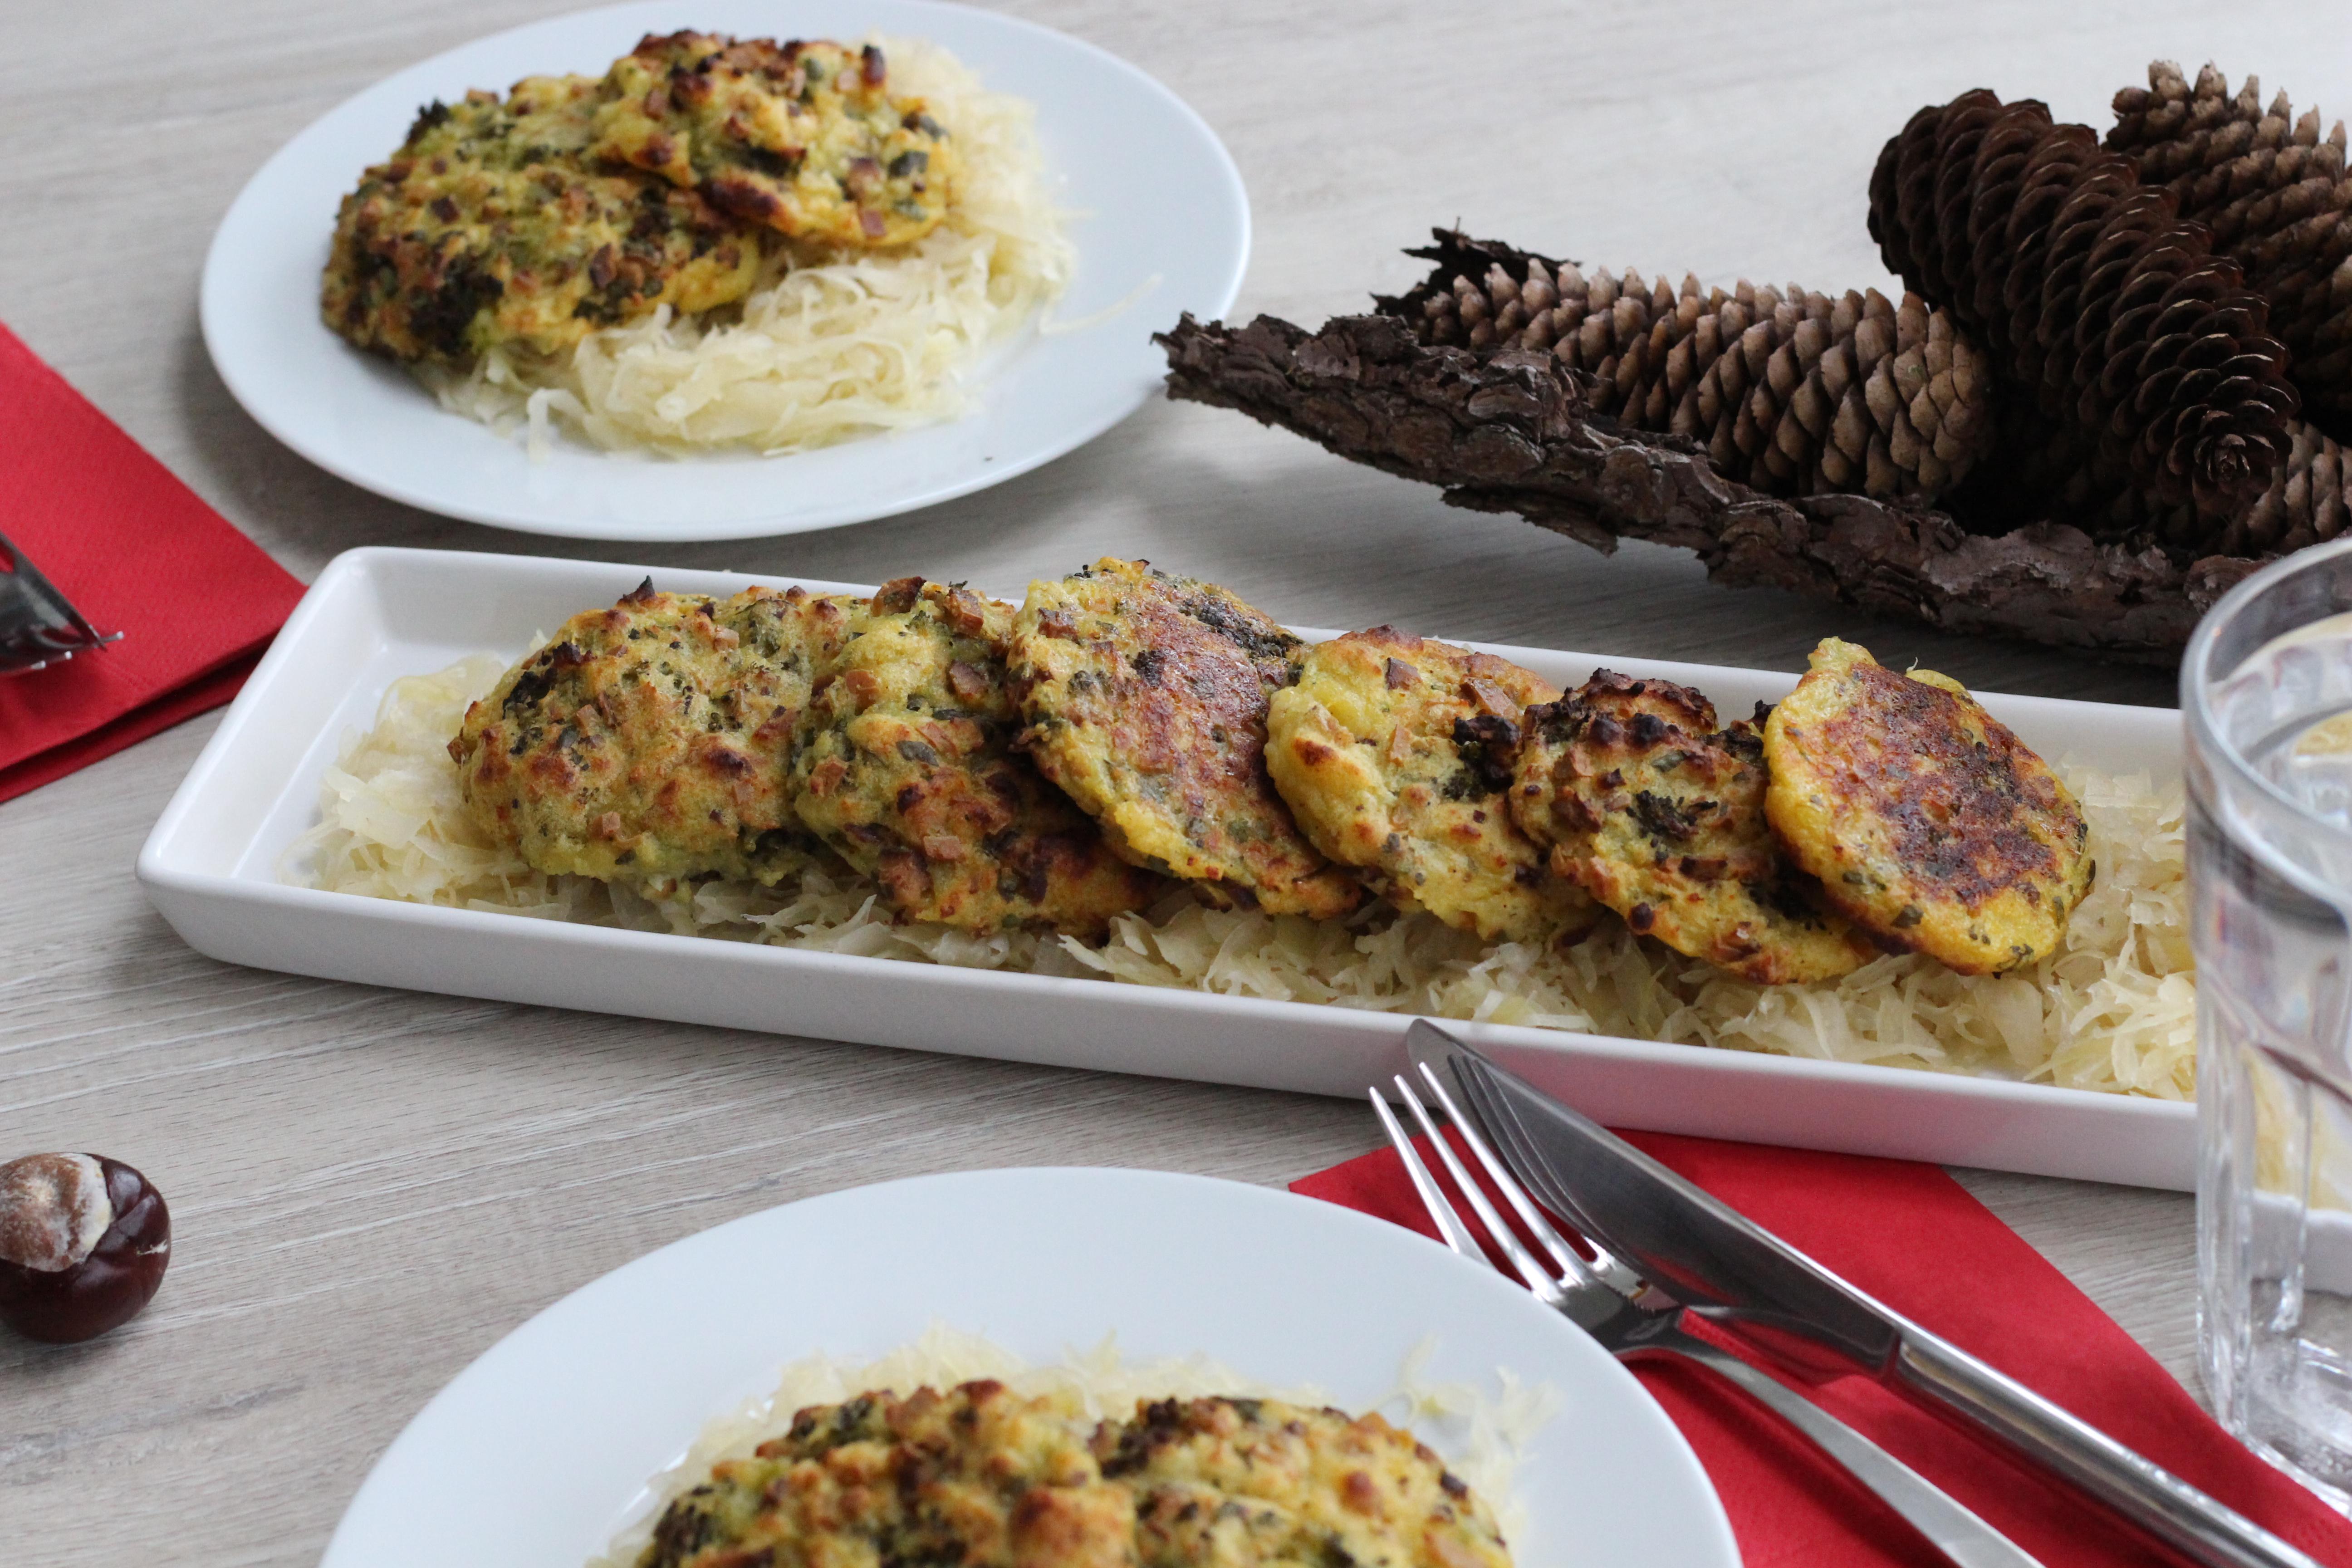 vegan-erdaepfel-speck-laibchen-austrian-food-homecooking-autumn-herbst-2